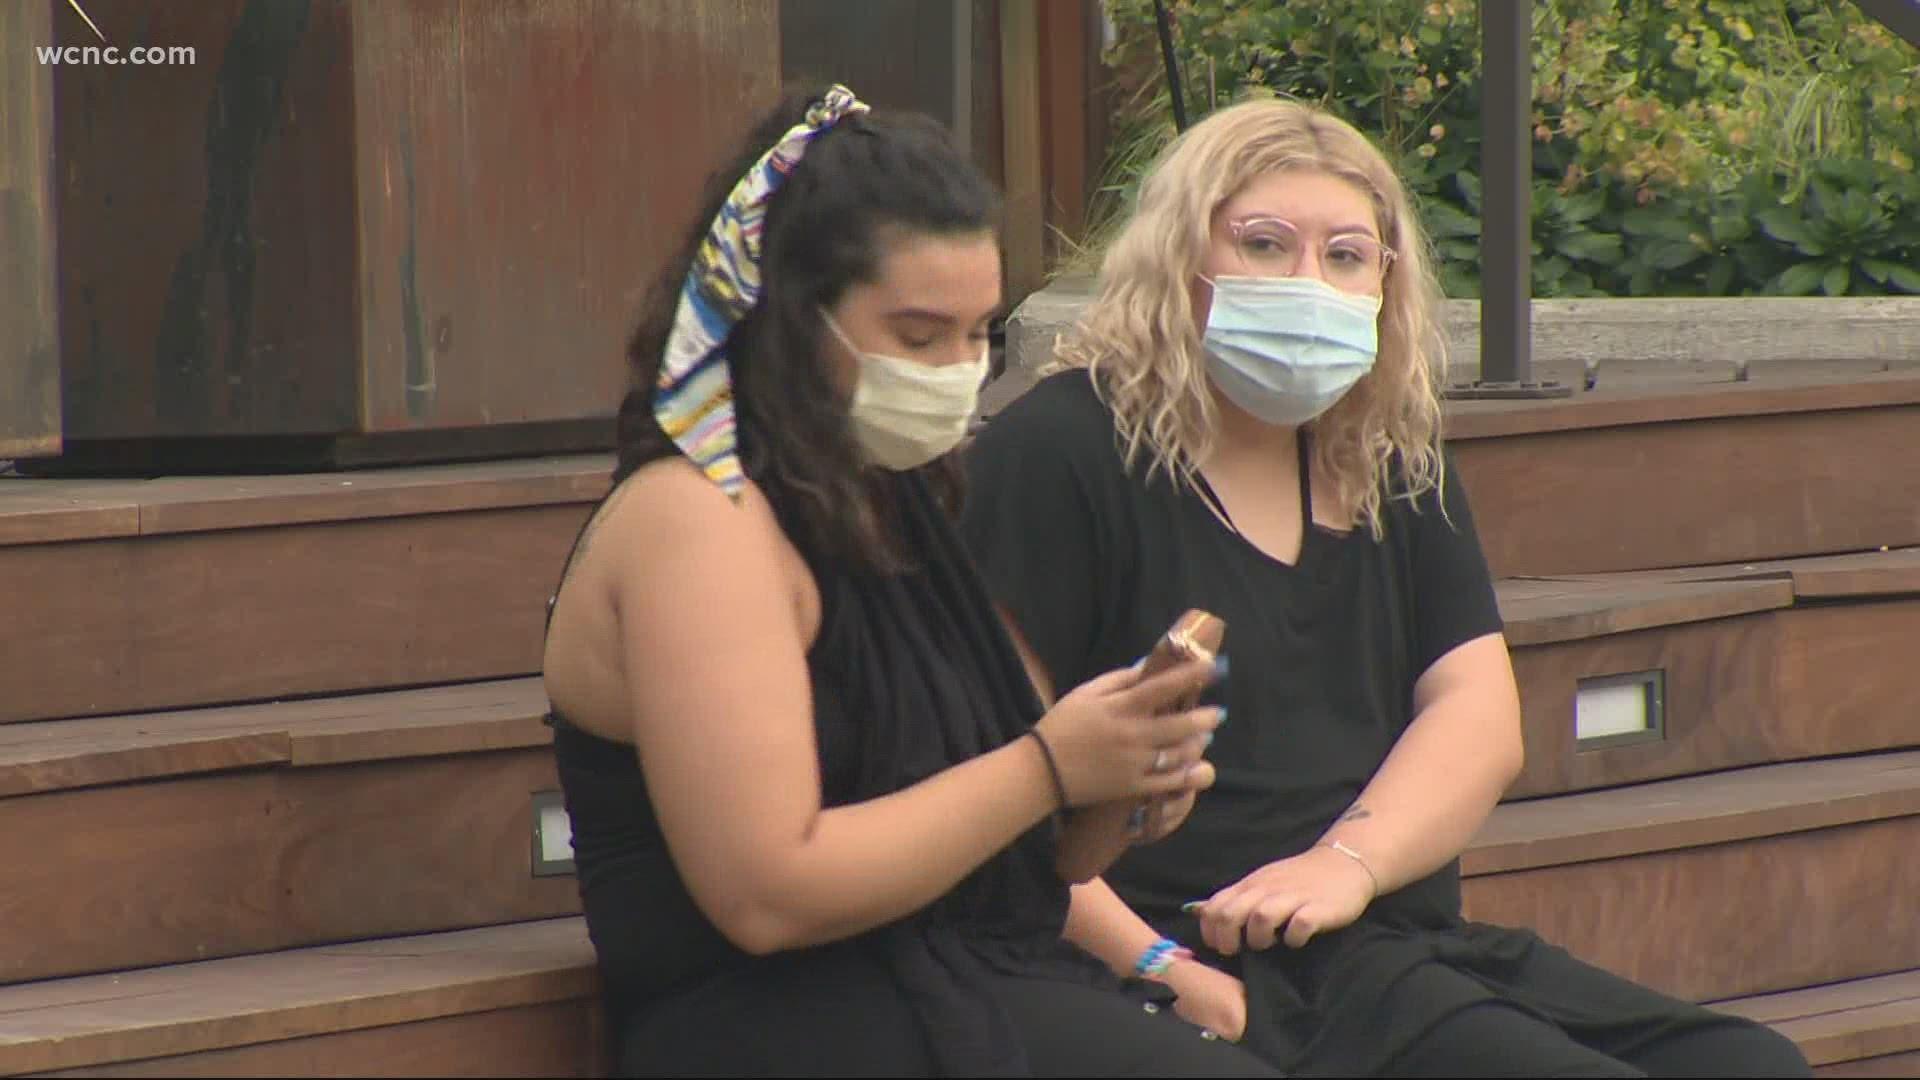 North Carolina Mask Mandate Some Support Some Oppose